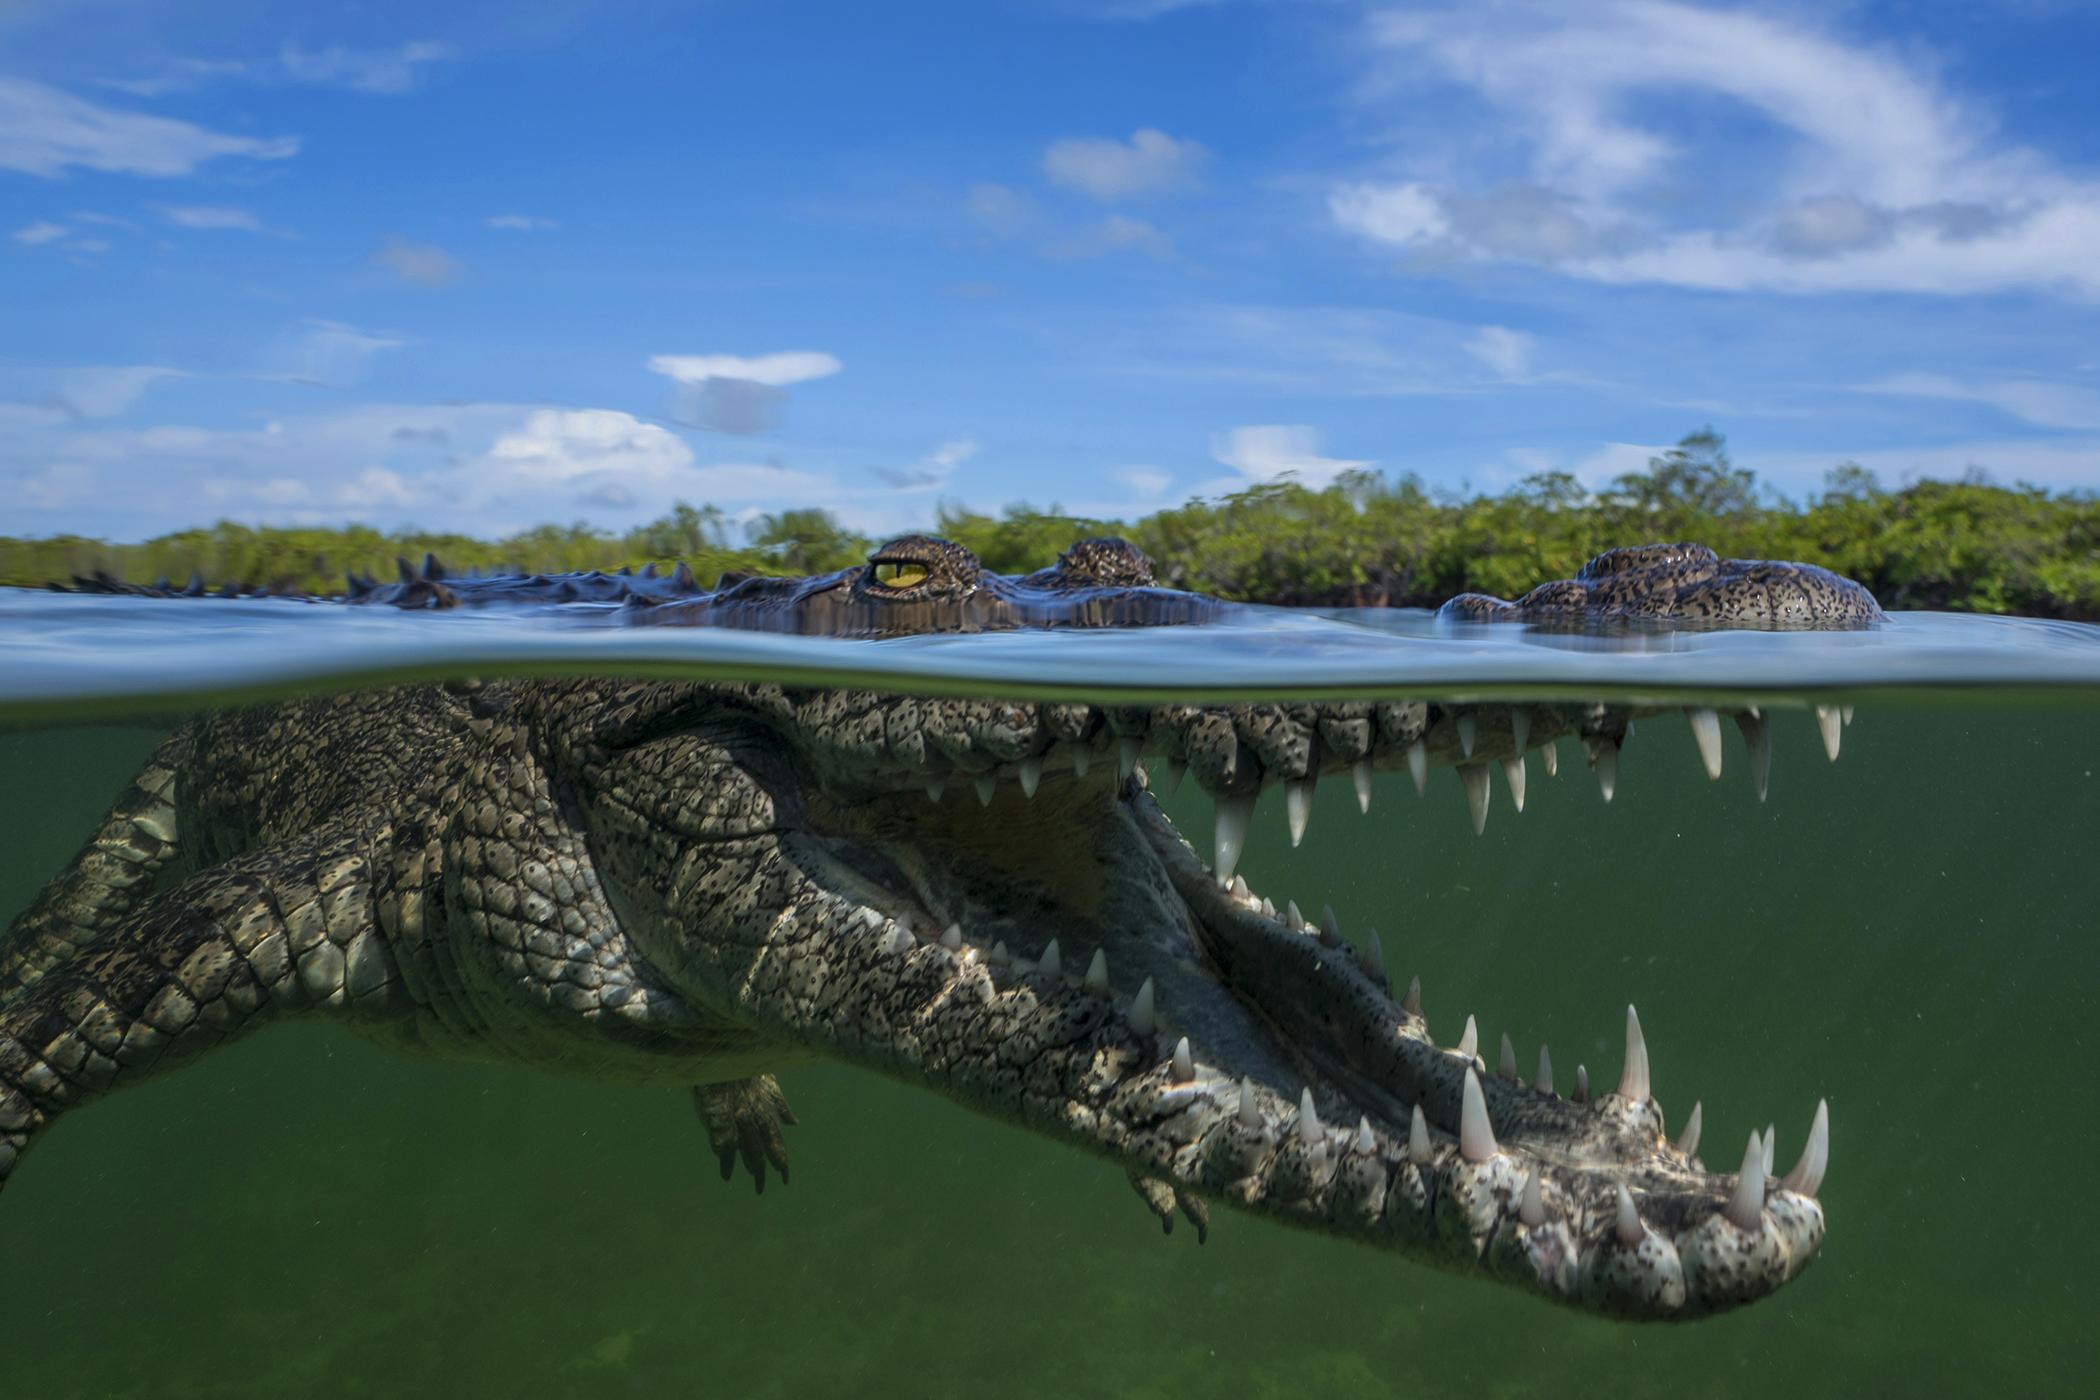 An American crocodile in Cuba.